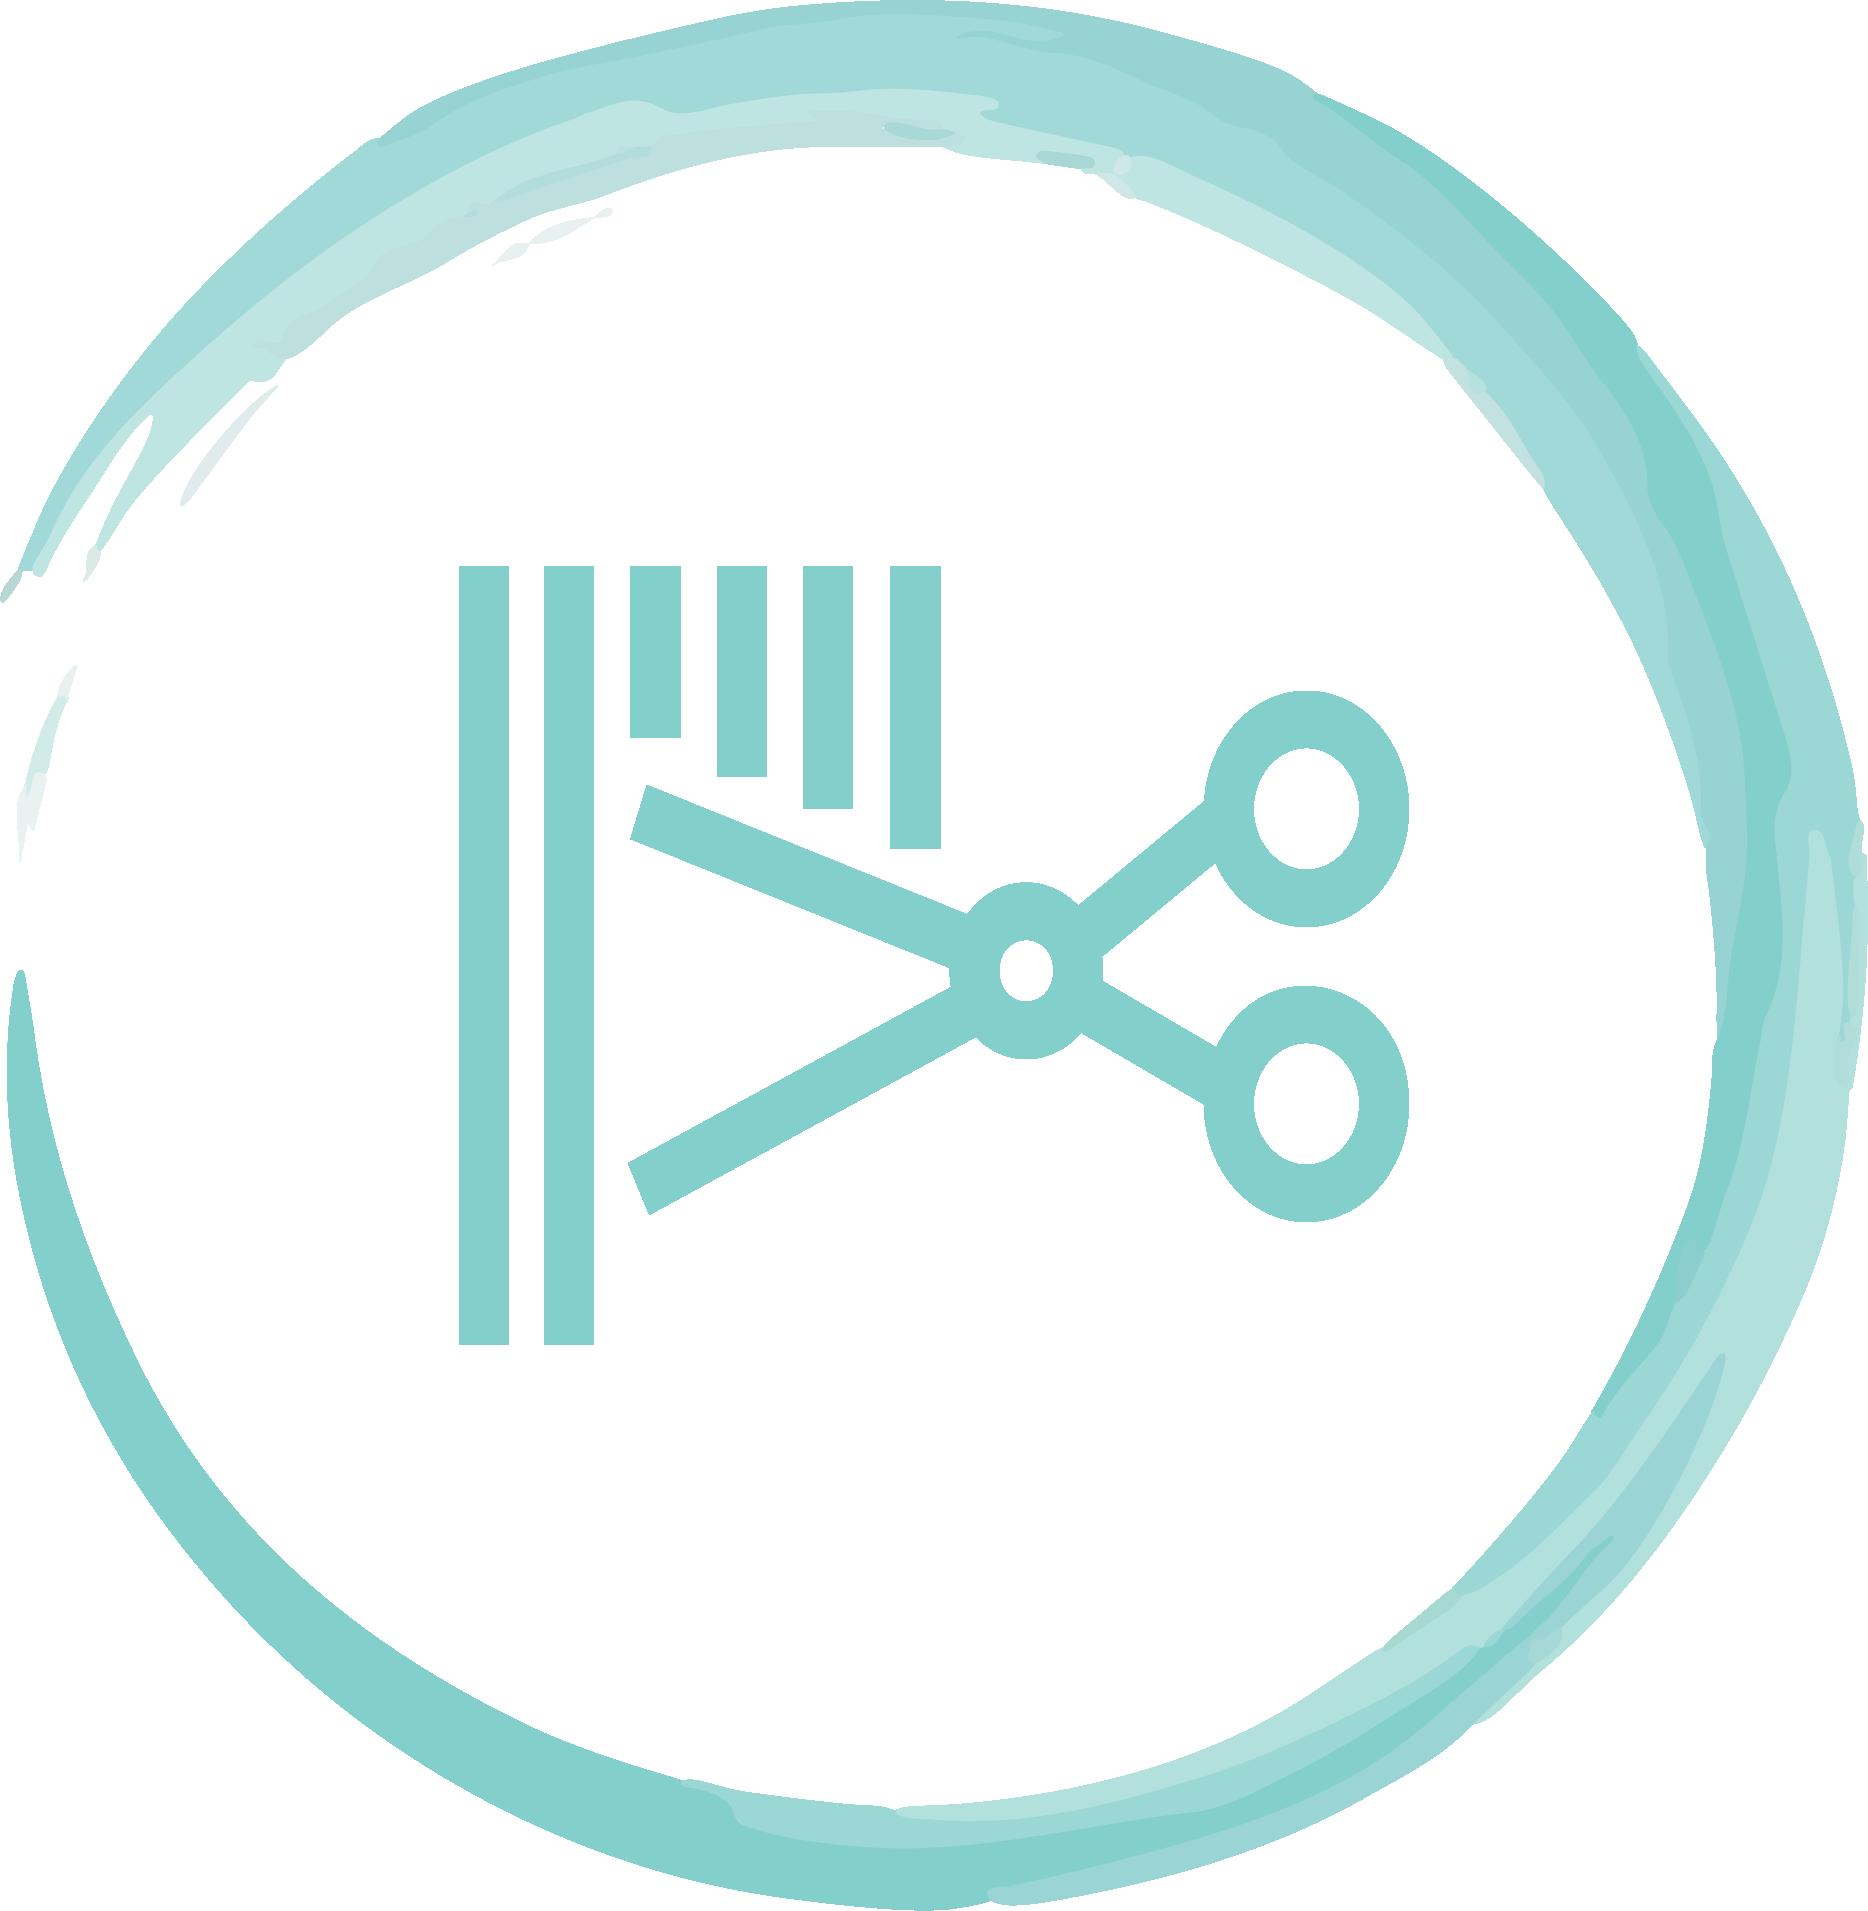 An icon of scissors cutting hair.